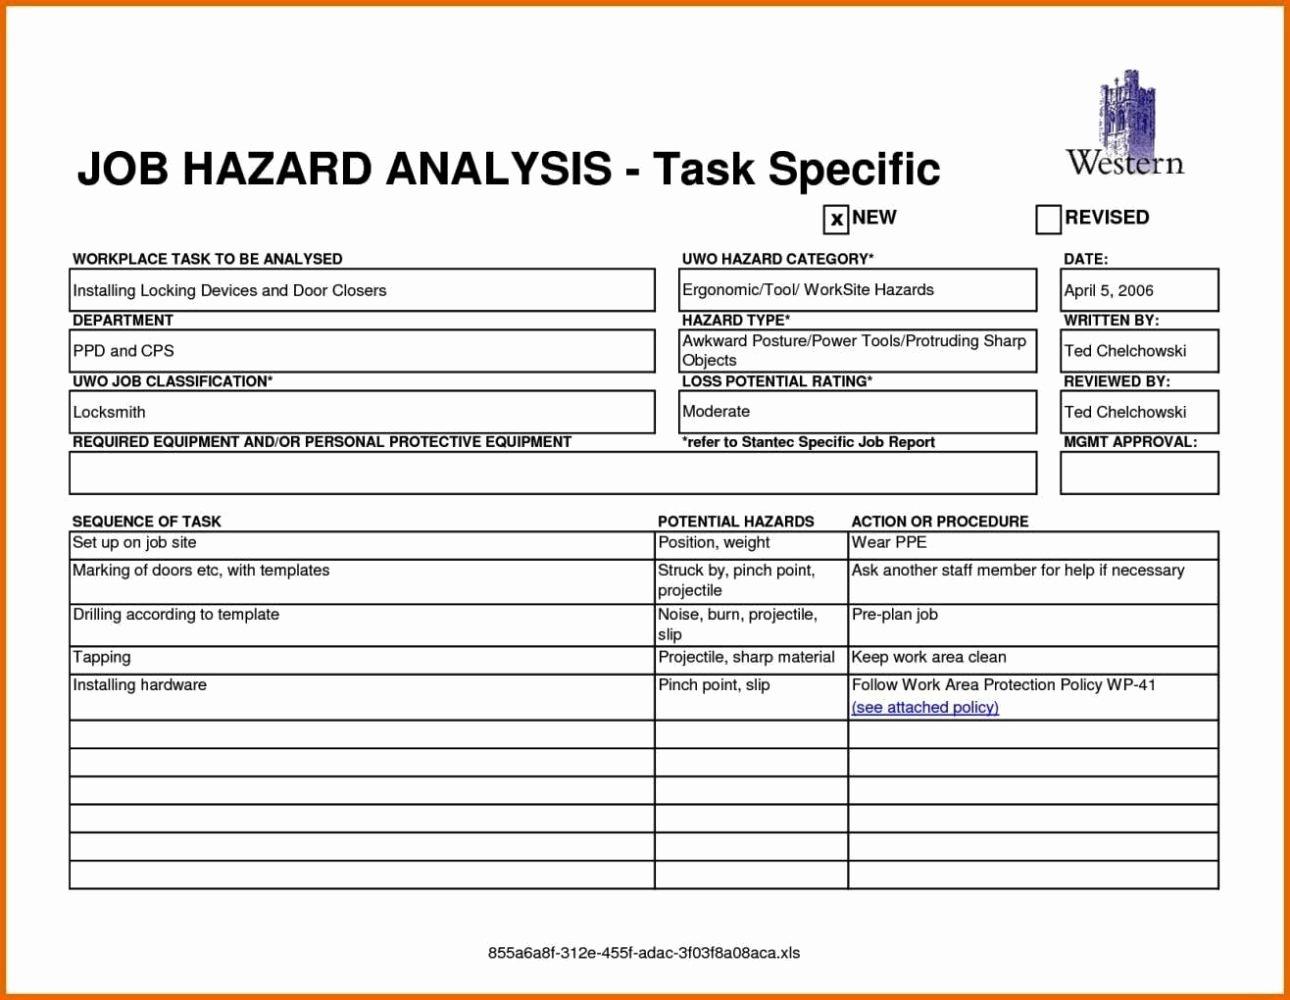 Activity Hazard Analysis Template Best Of Activity Hazard Analysis Templates Sampletemplatess